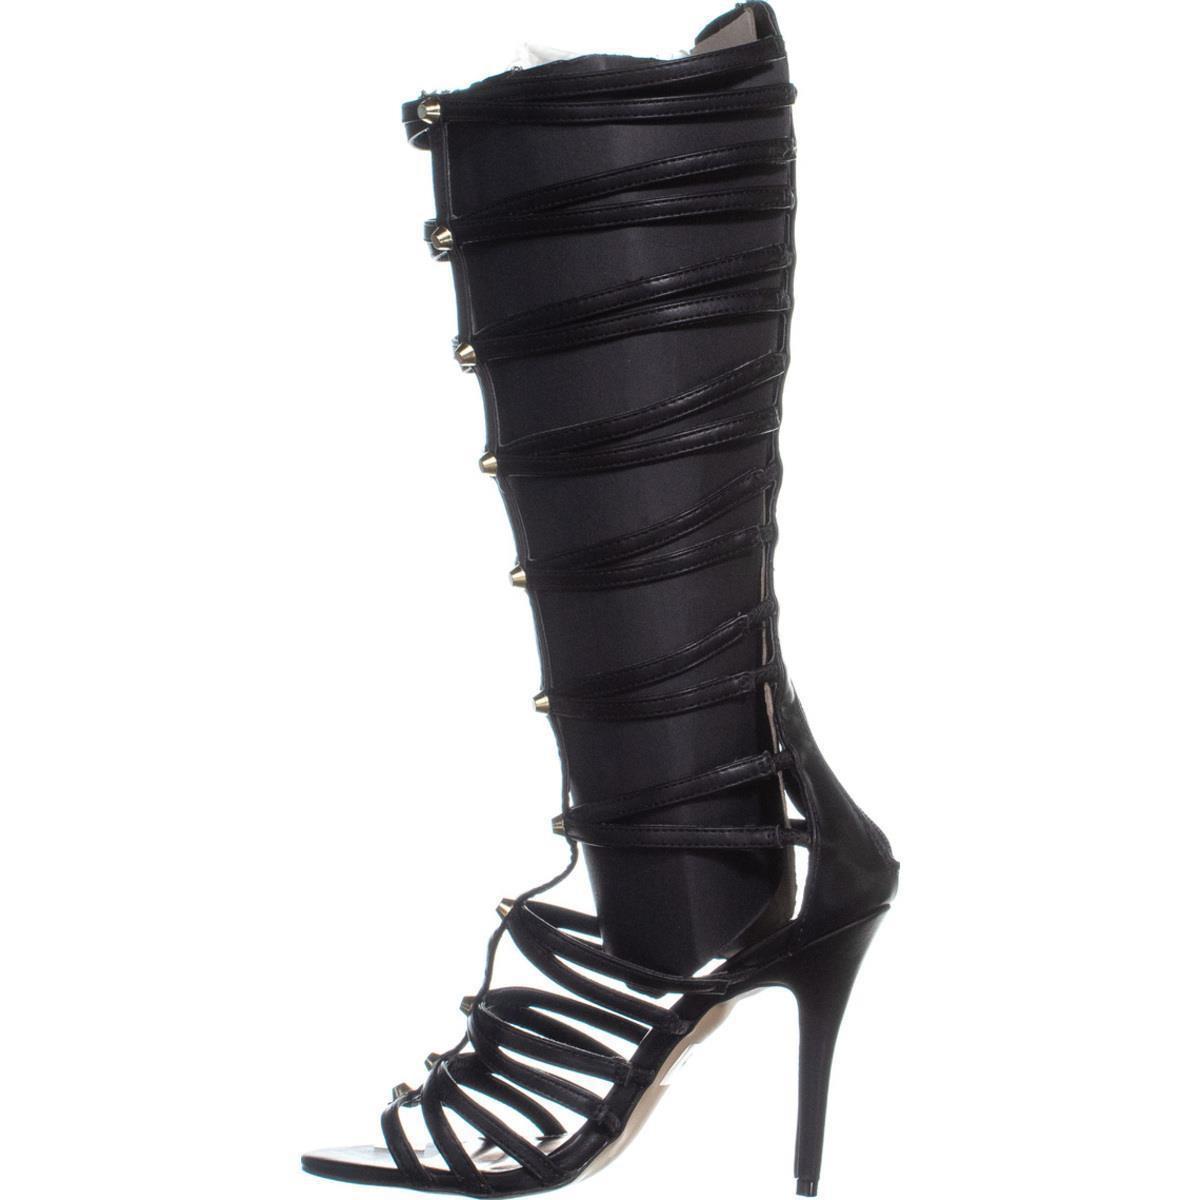 a299473d5326 Lyst - Madden Girl Brazen Knee High Gladiator Sandals in Black